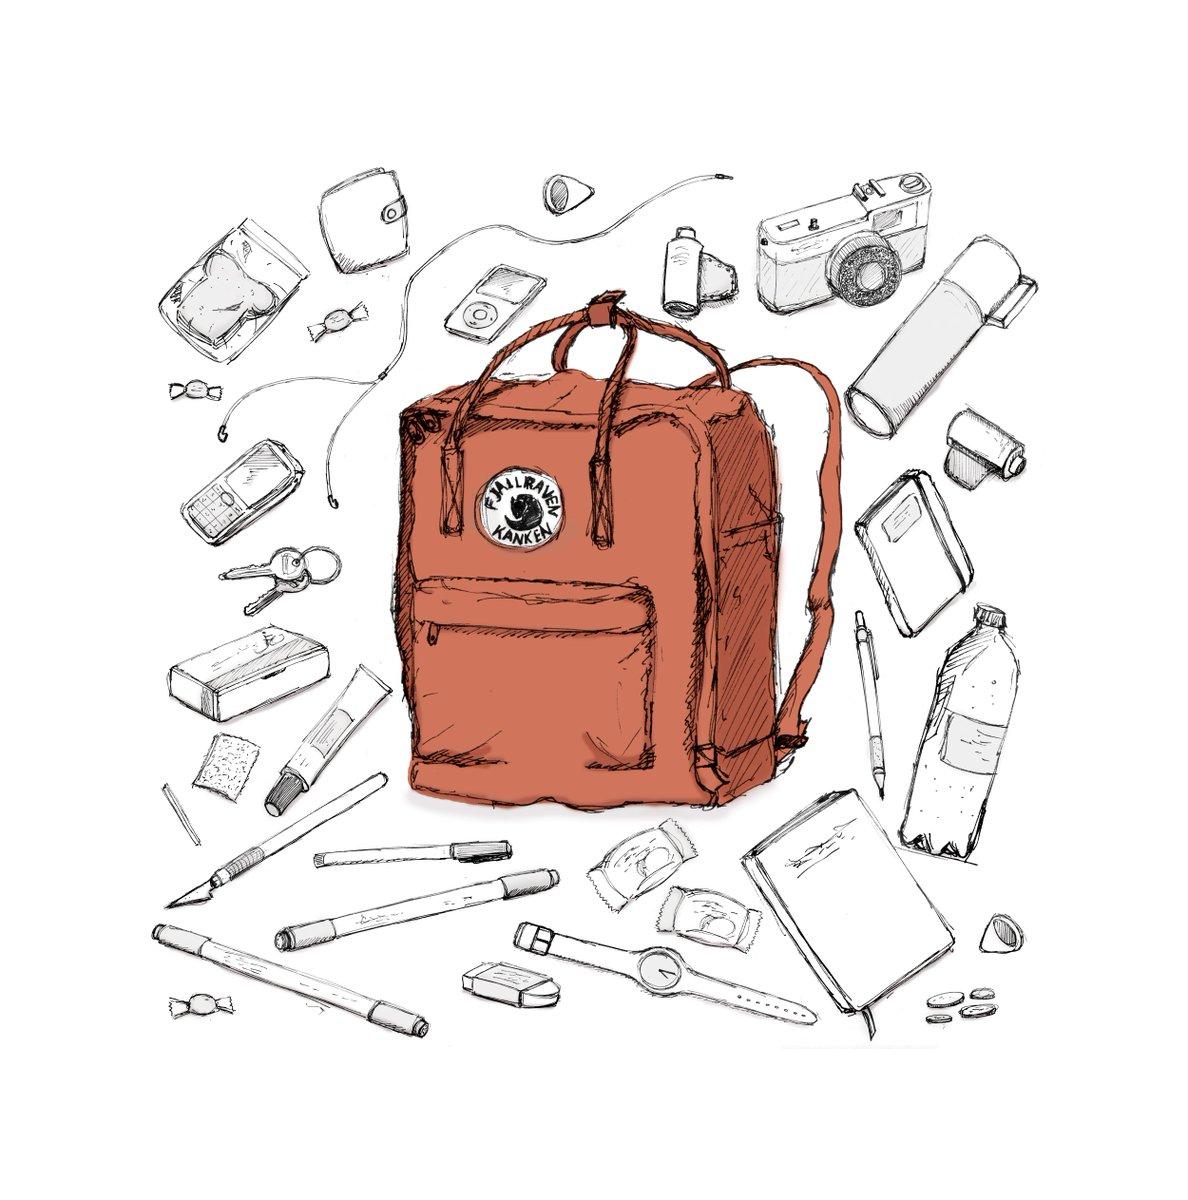 4 Reasons to Get a Kanken Backpack